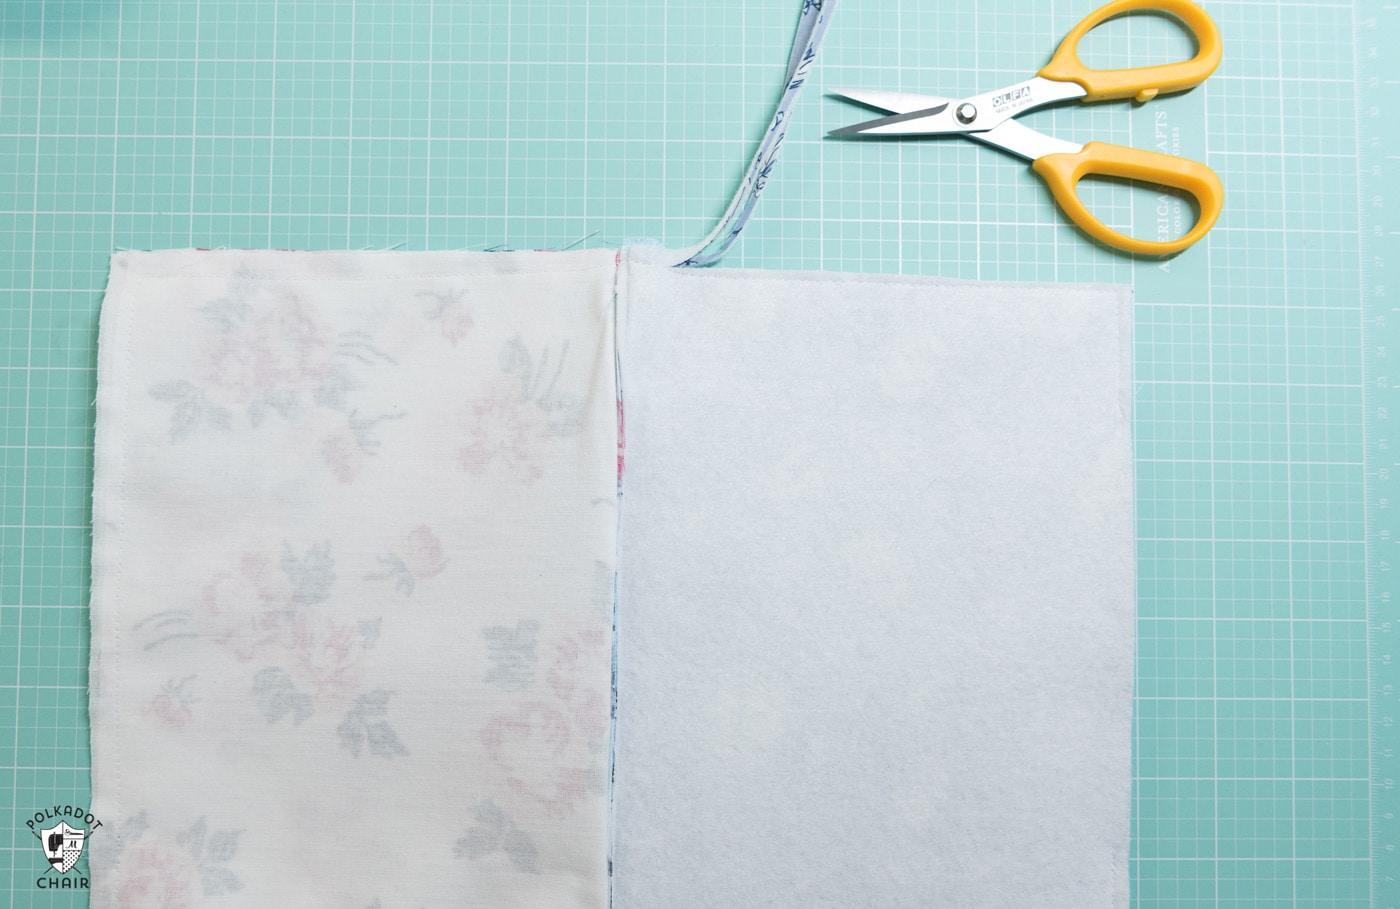 scissors zippered pouch tutorial in progress on cutting mat